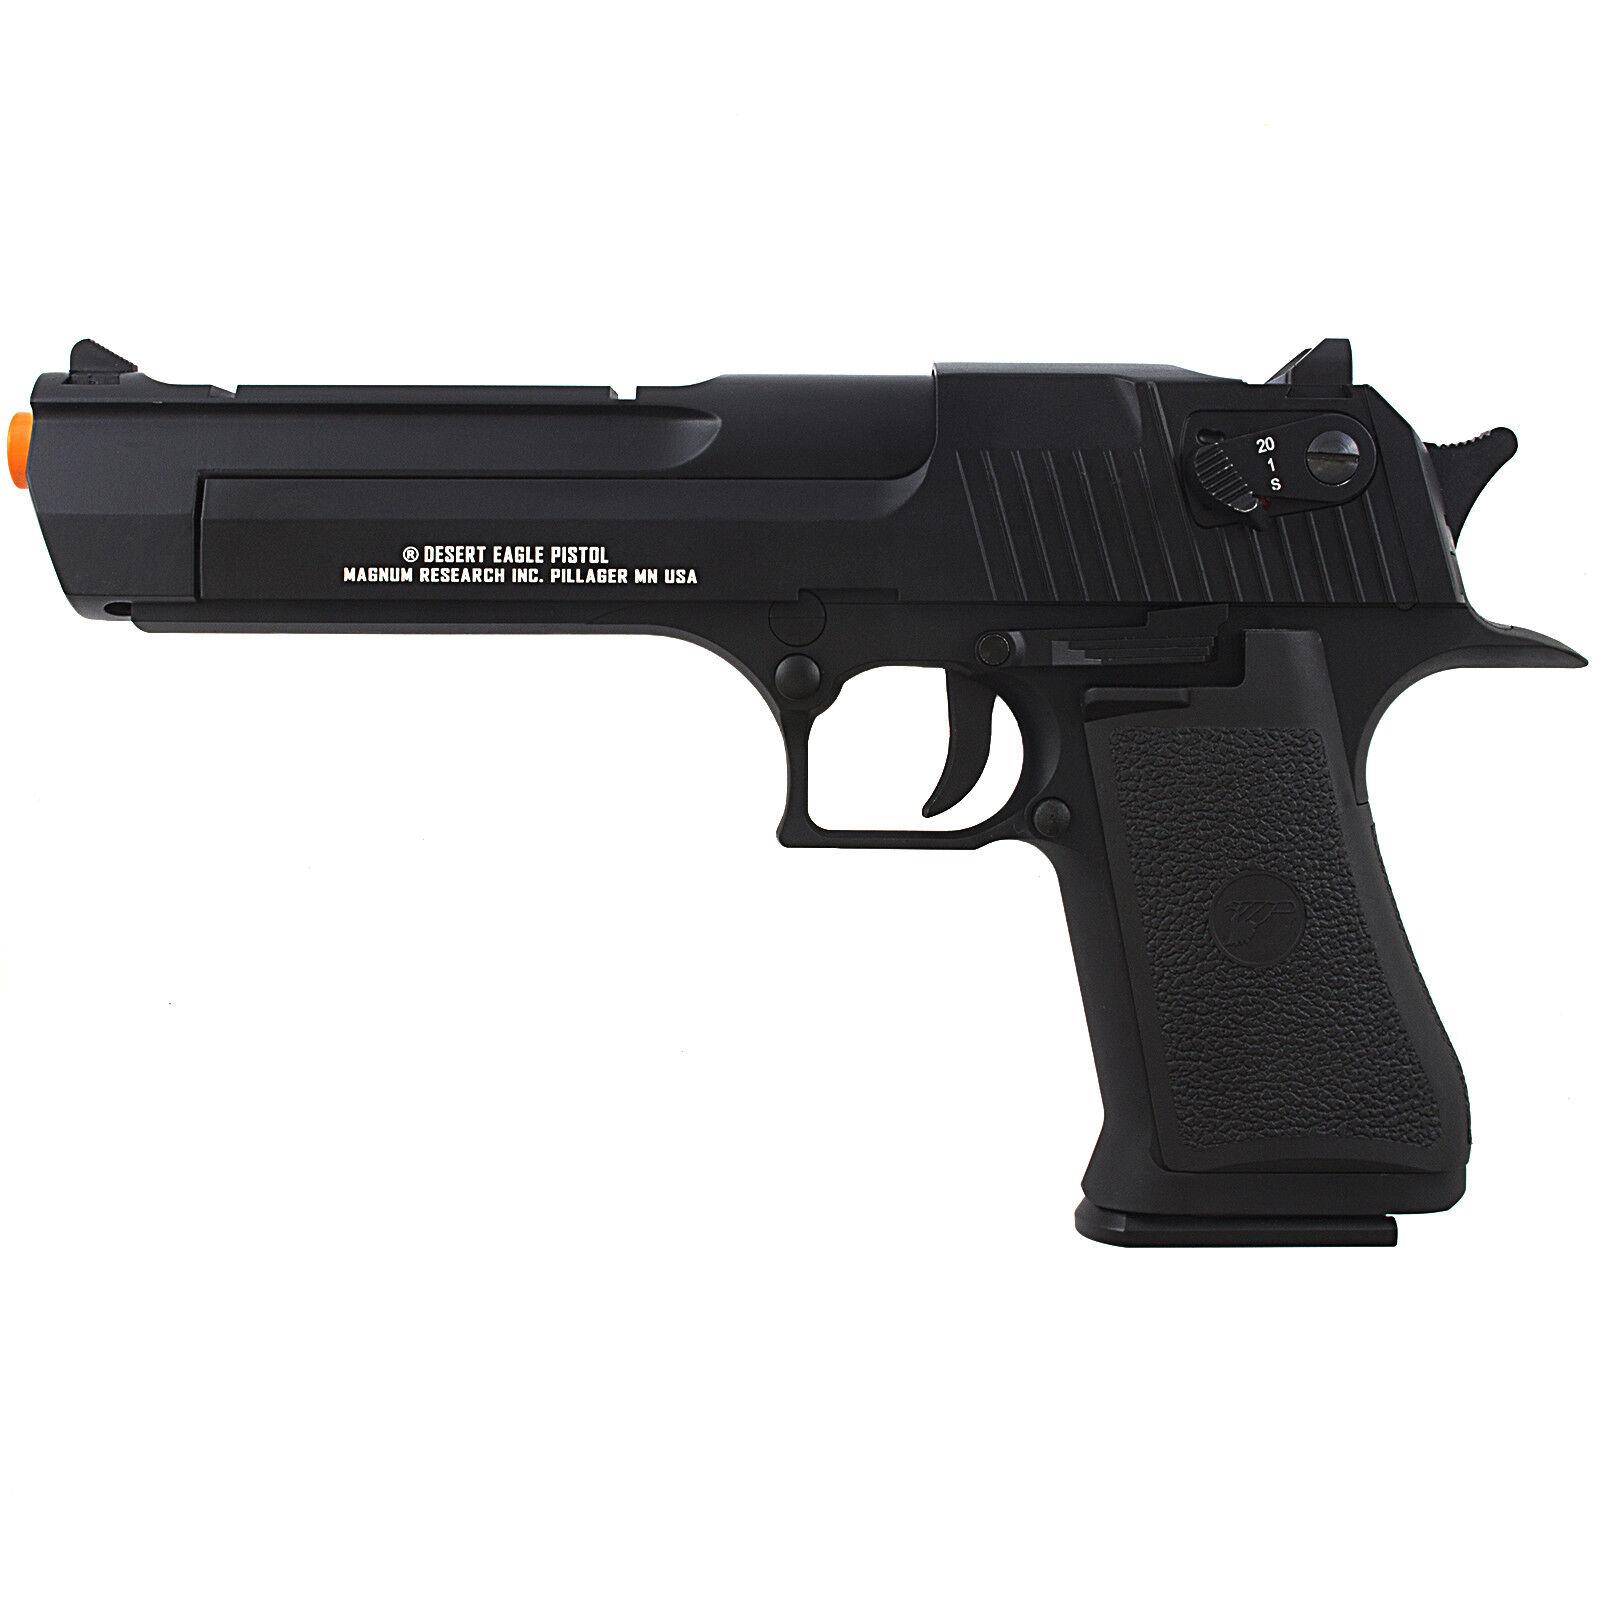 Jericho 941 Baby Desert Eagle Co2 Airsoft Pistol For Sale Online Ebay